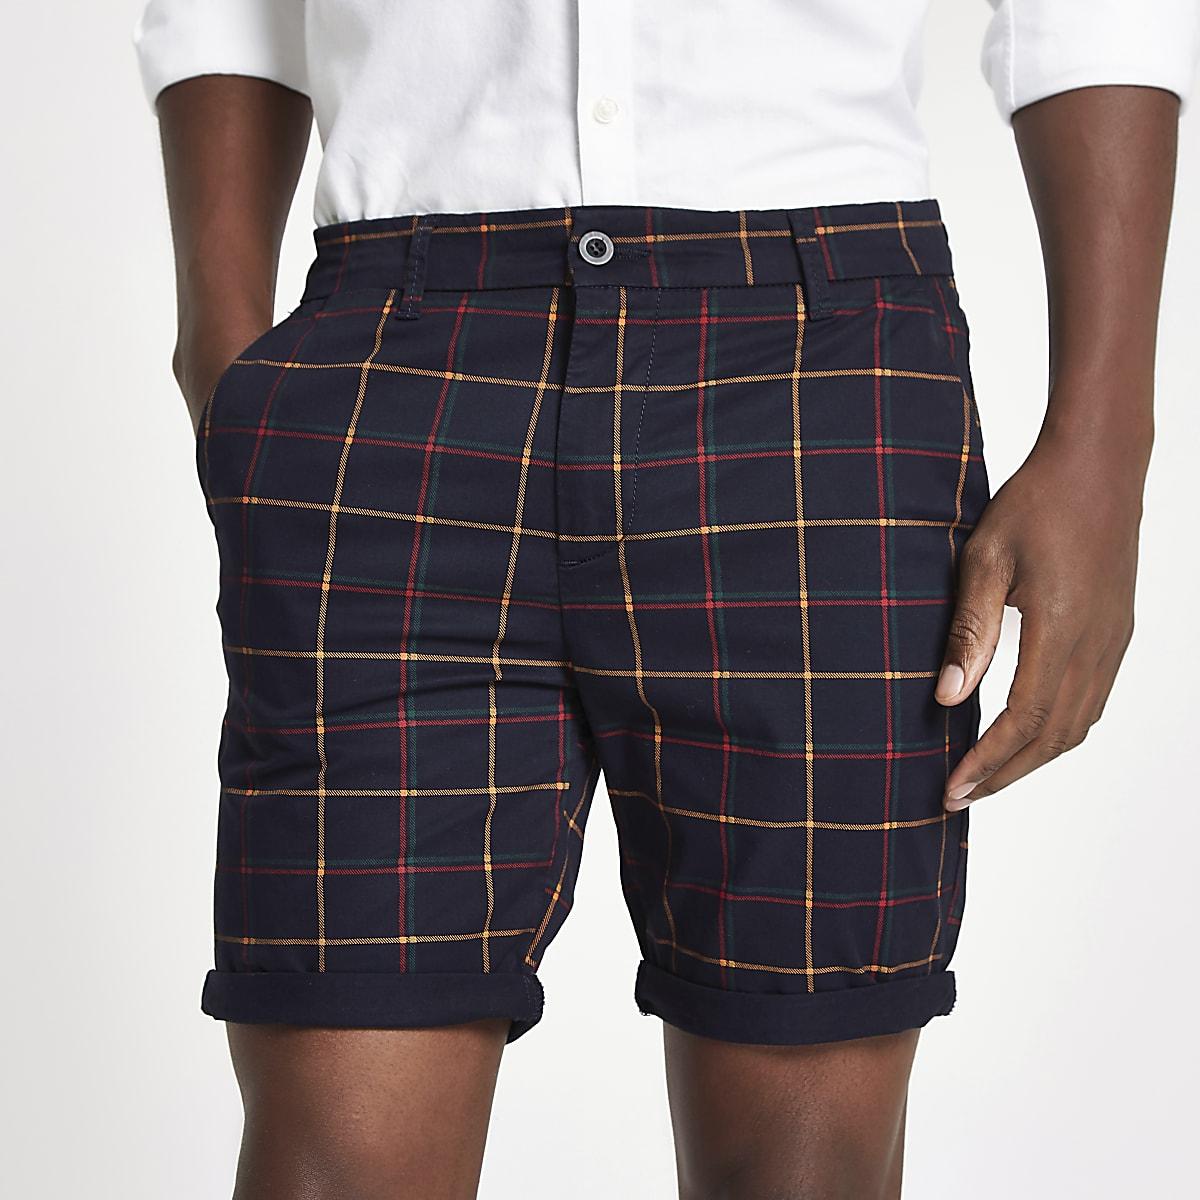 68a16e00412 Navy check turn-up hem skinny fit shorts - Smart Shorts - Shorts - men